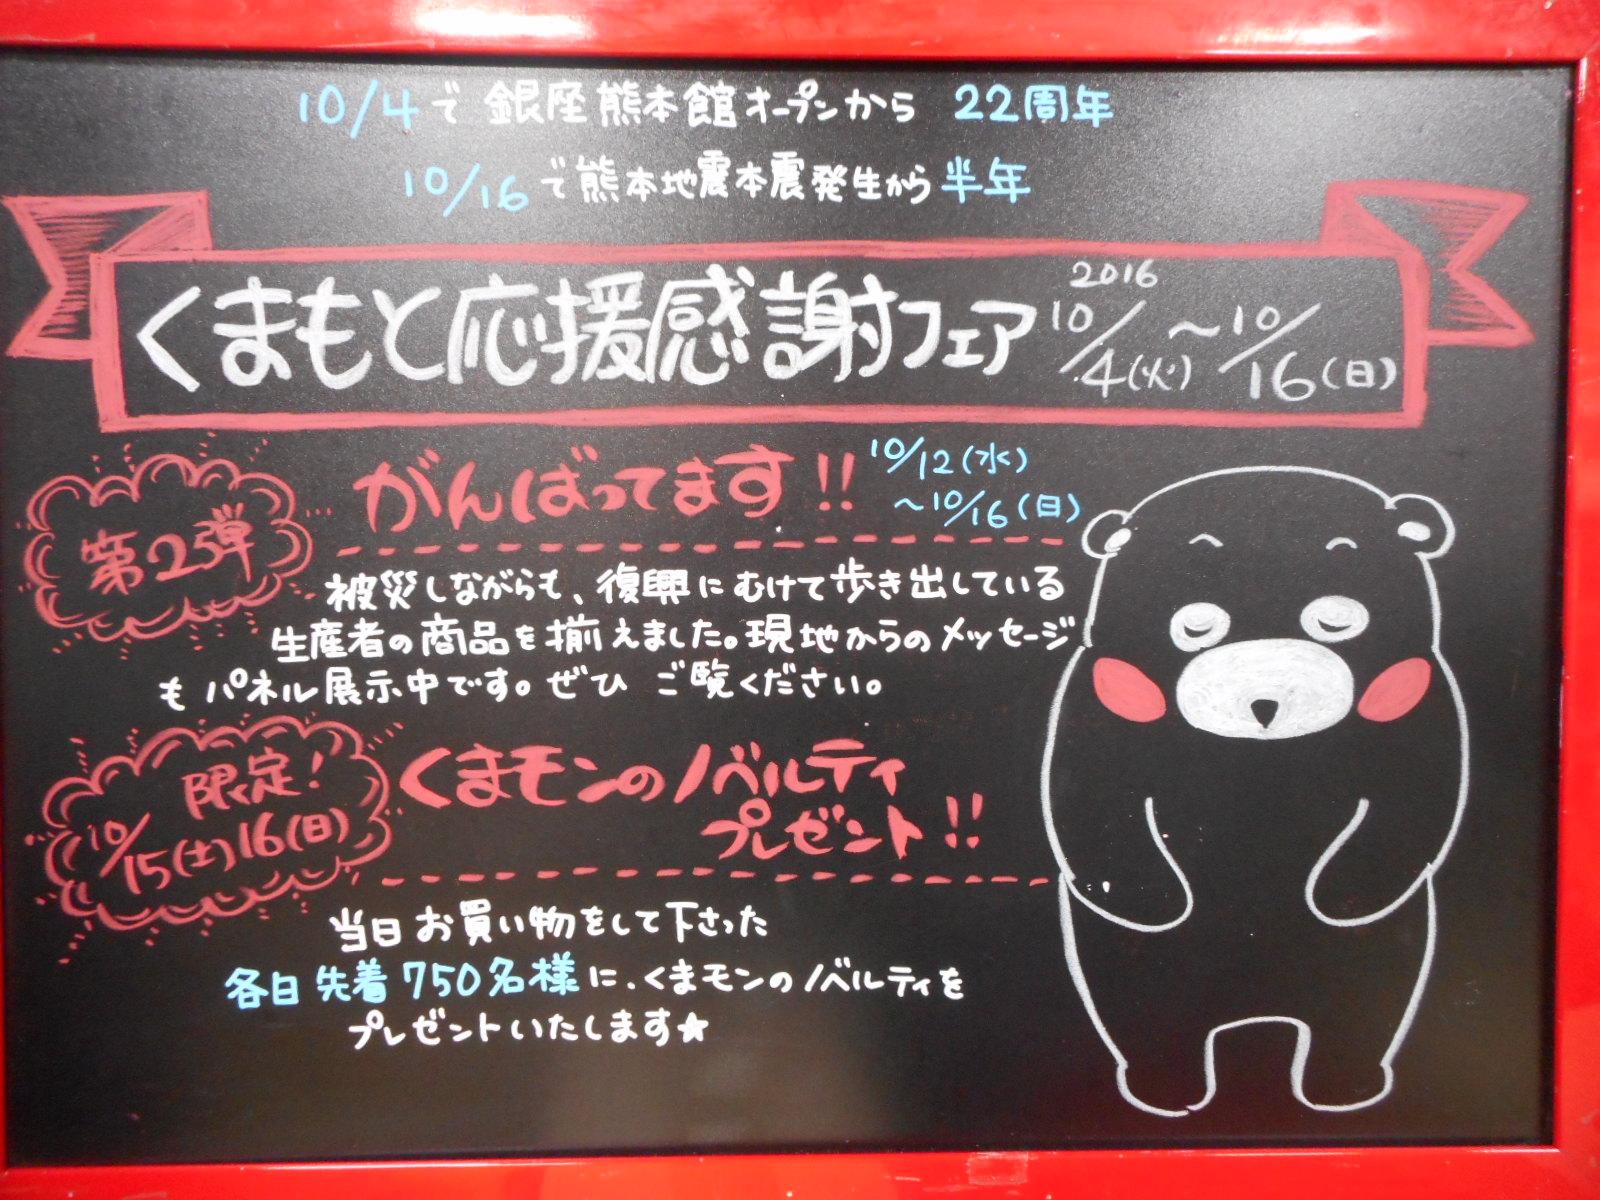 20161012144522bcc.jpg